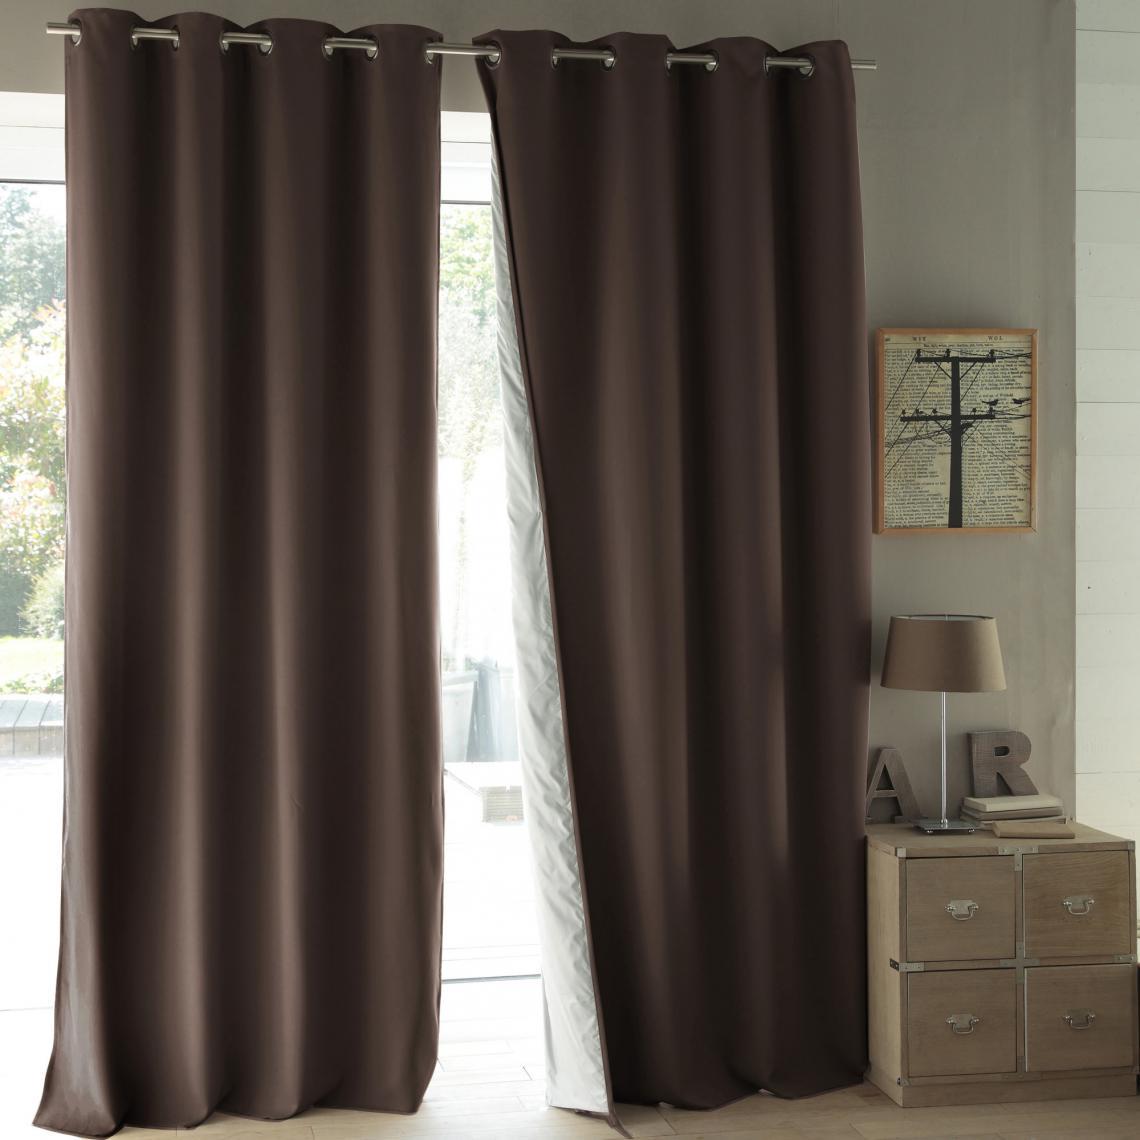 rideau occultant thermique oeillets moondream marron 3 suisses. Black Bedroom Furniture Sets. Home Design Ideas